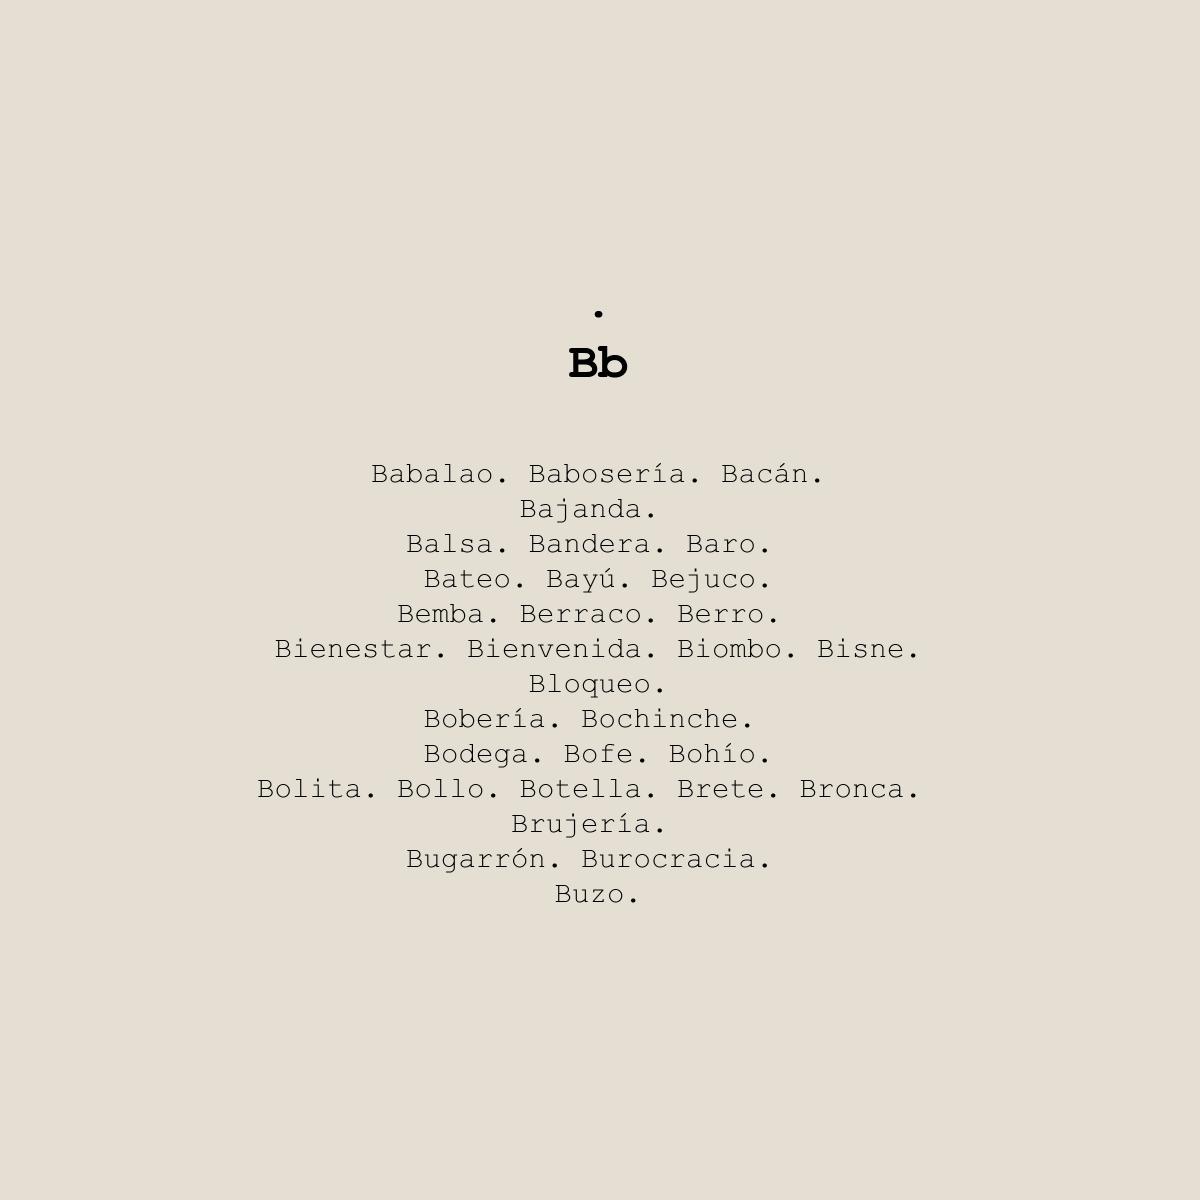 02Bb. Speech, 2007 - Performance, Book (Naivy Perez)